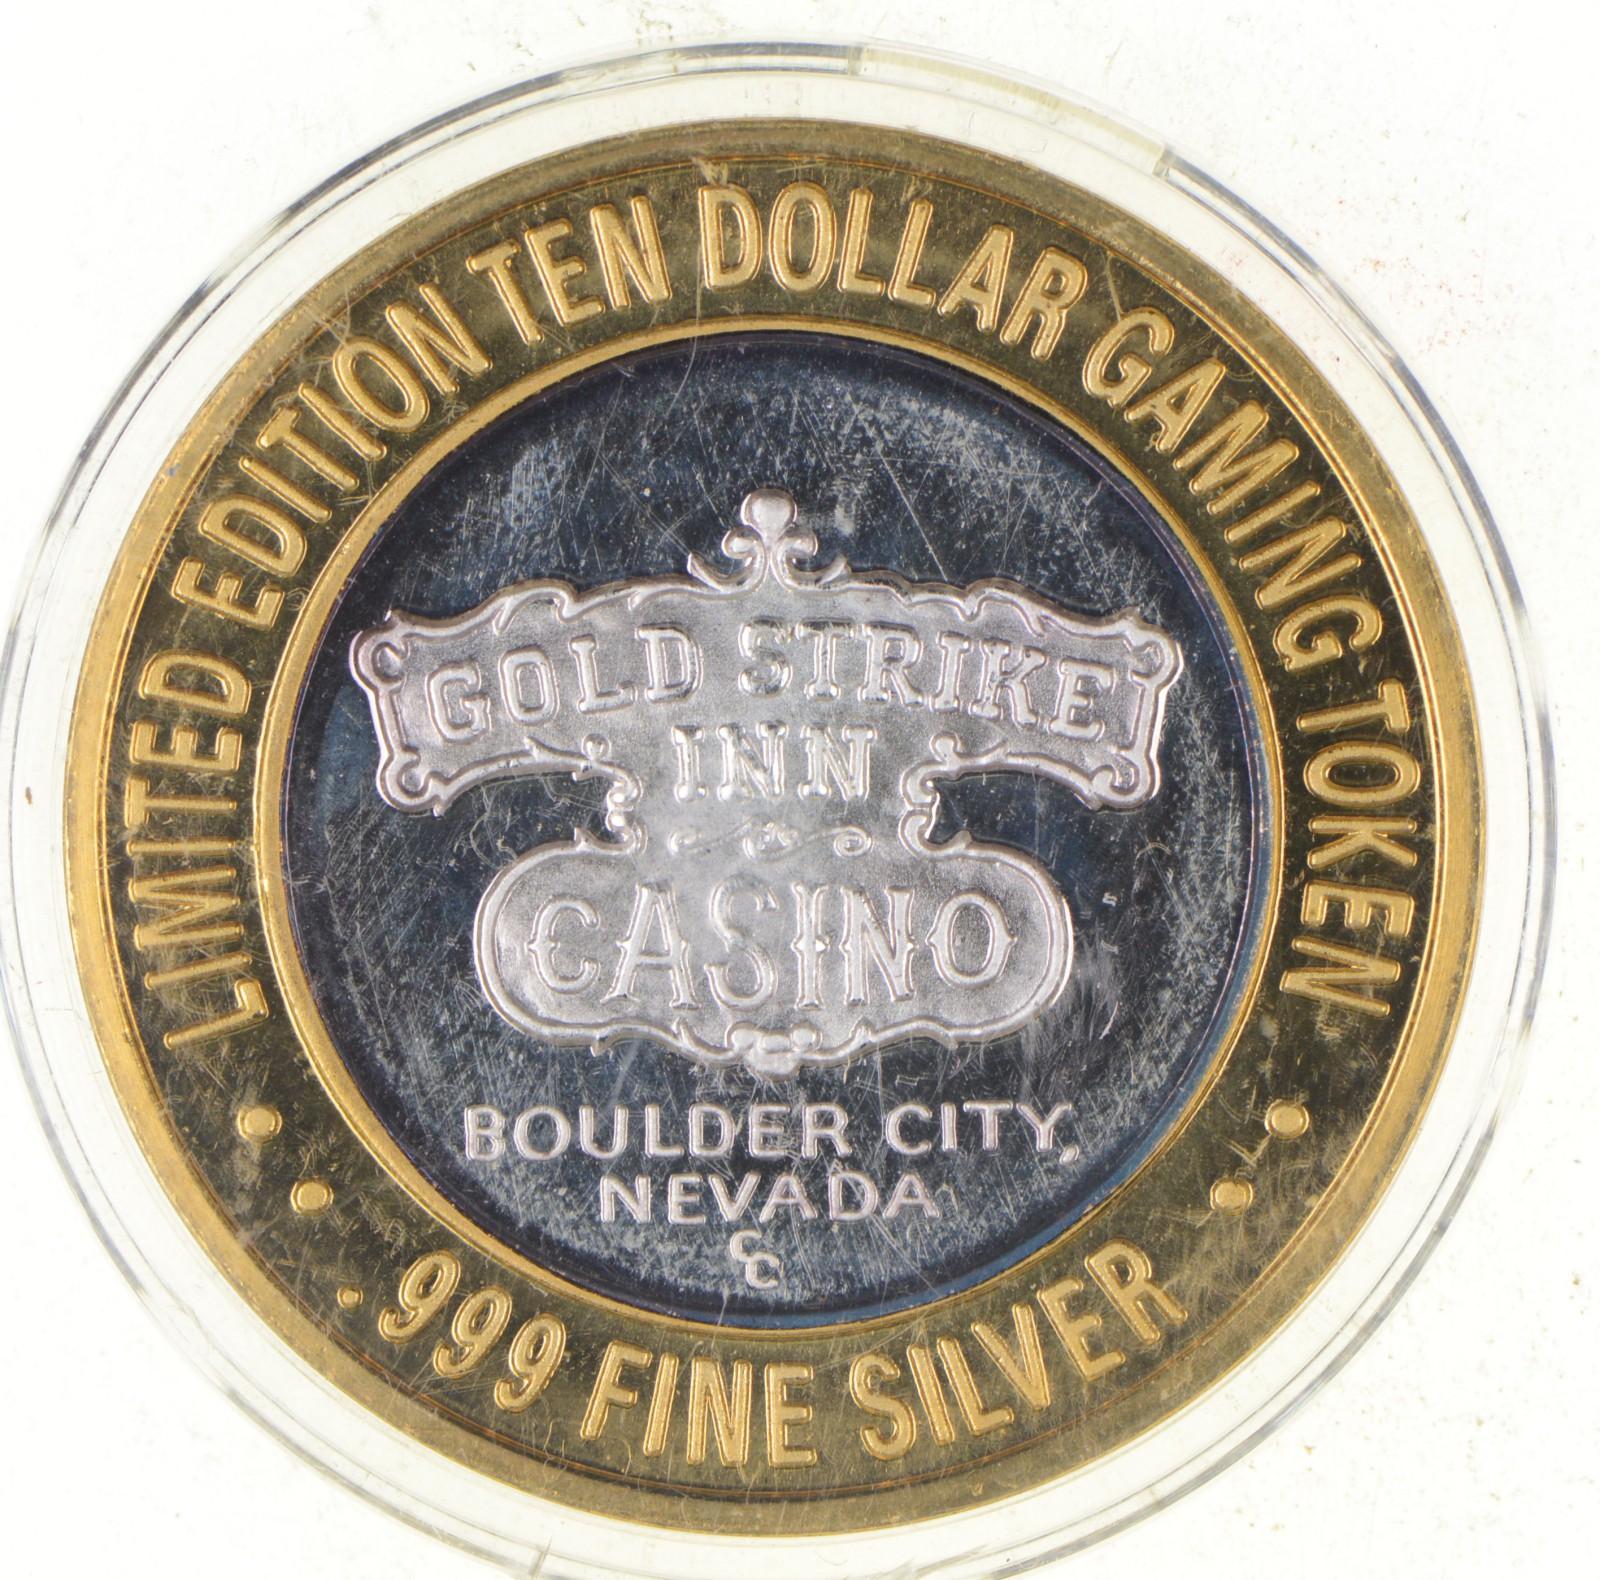 Fond casino